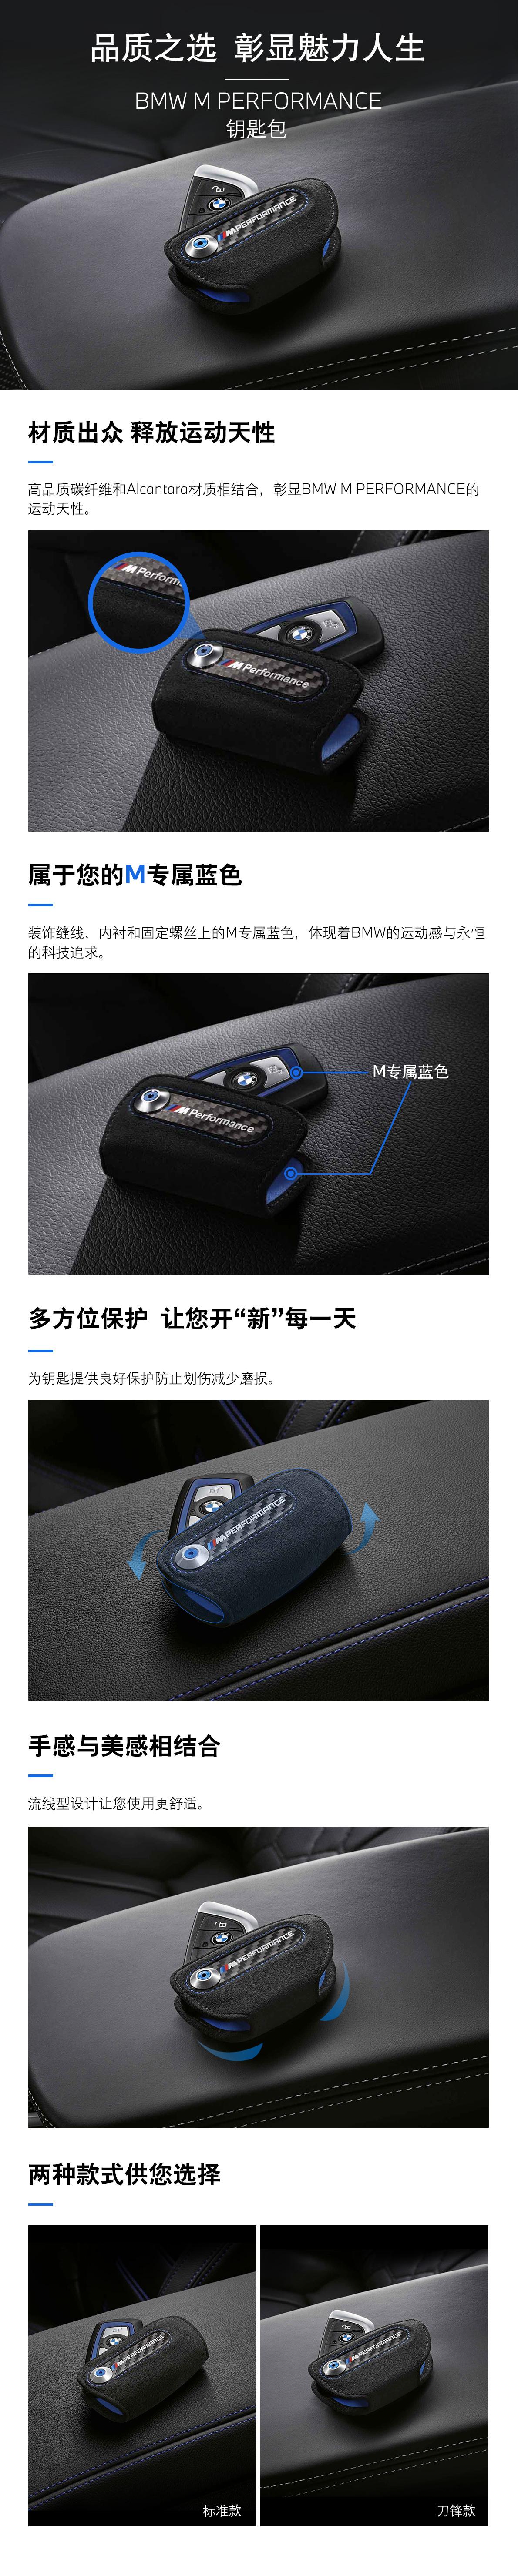 BMW宝马 创意钥匙包/钥匙壳 液晶钥匙套 M系列车钥匙包